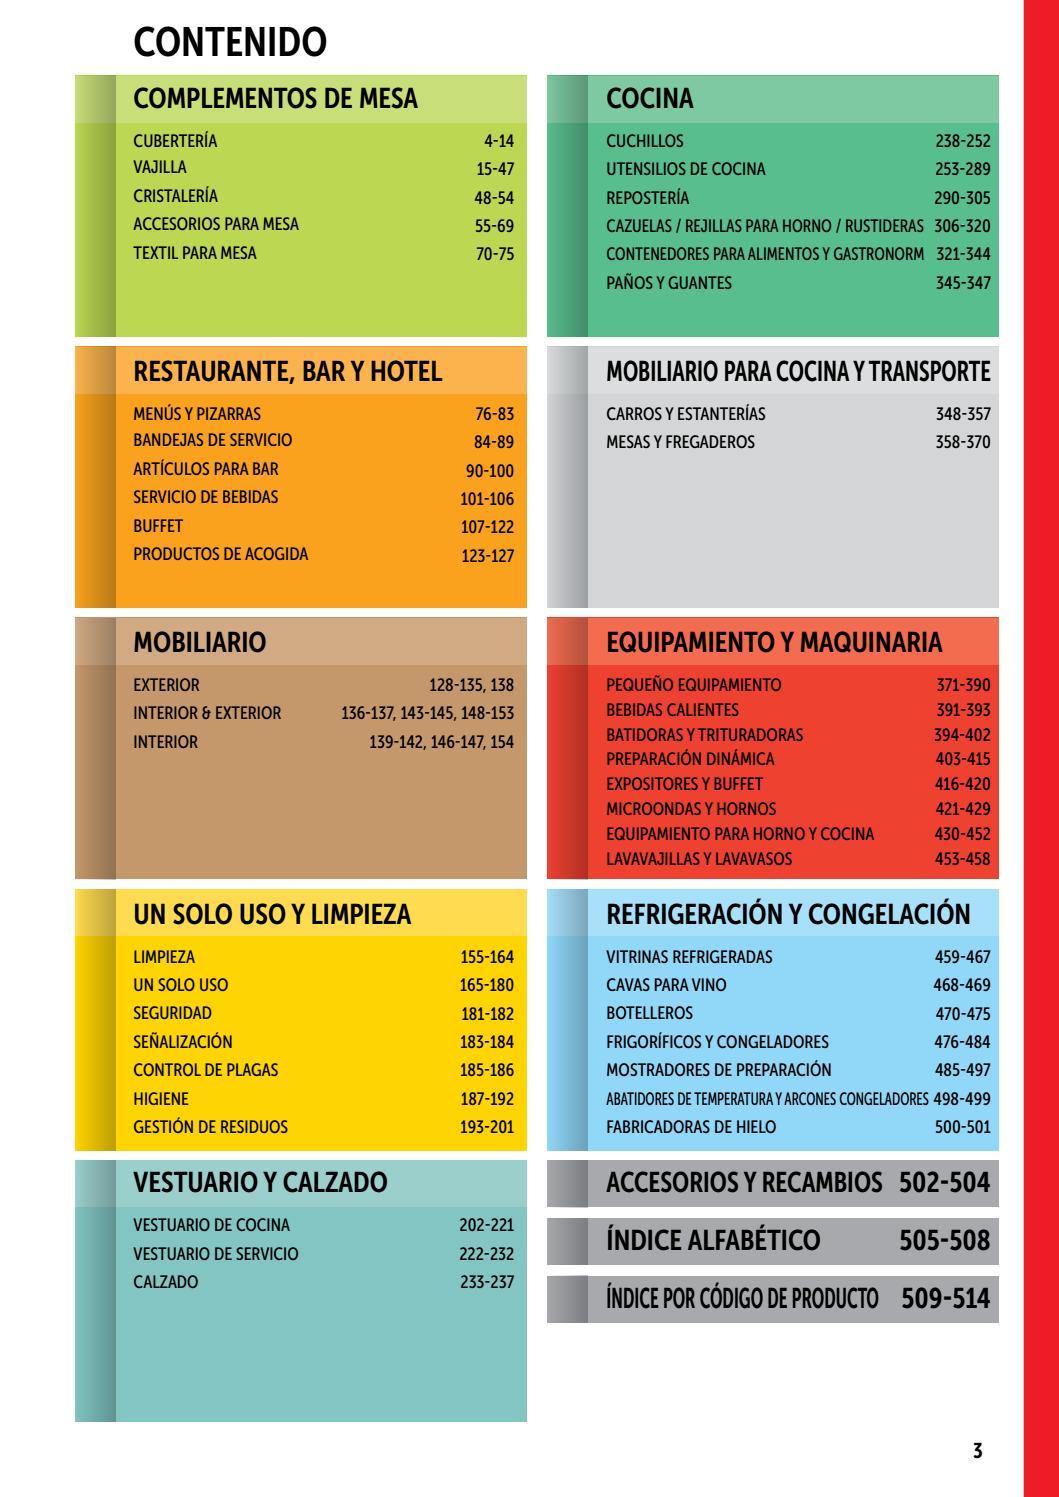 Digital 400 Lb Escala De Peso Corporal Electronica Lcd De Marcacion De Bano G...